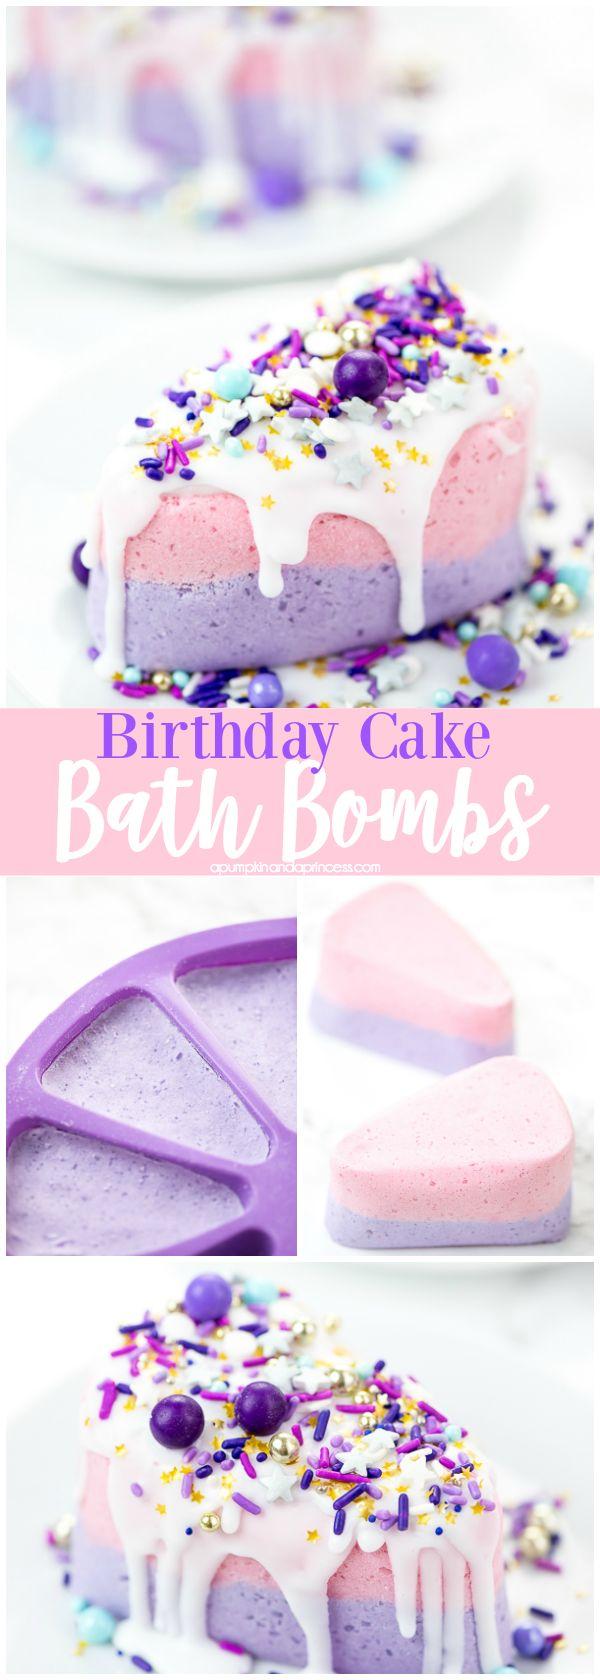 DIY Cake Bath Bomb